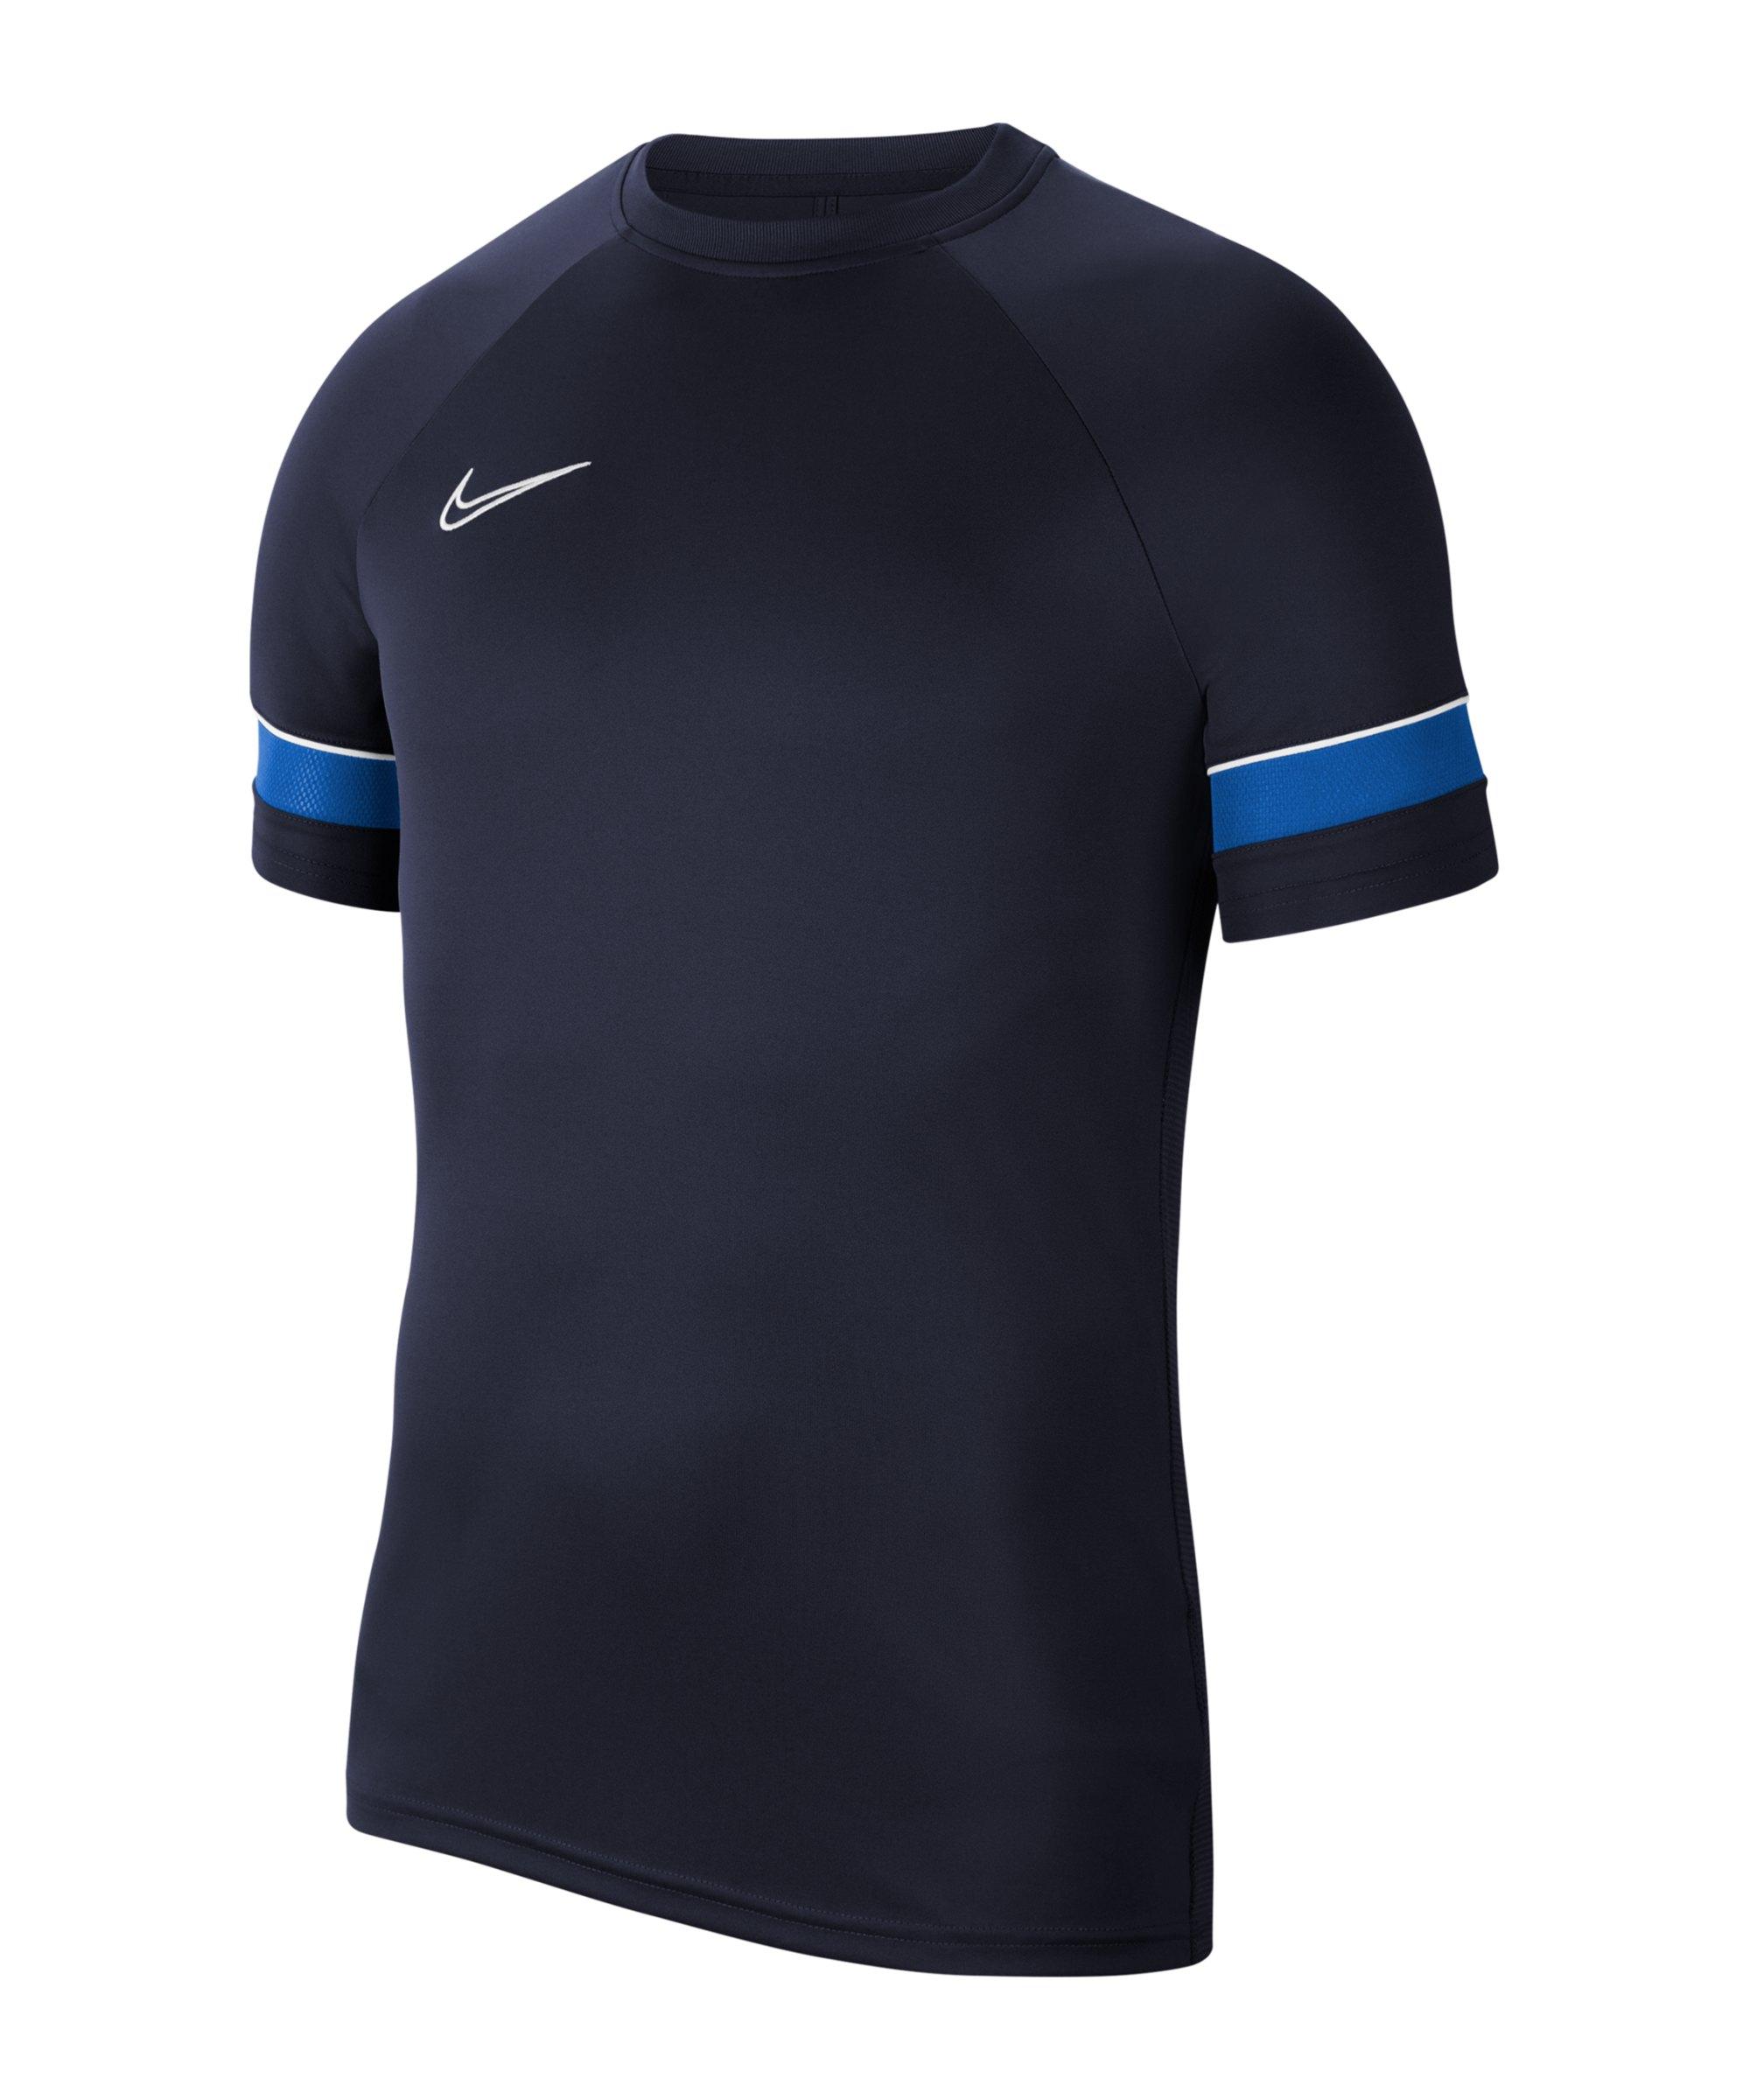 Nike Academy 21 T-Shirt Kids Blau Weiss F453 - blau